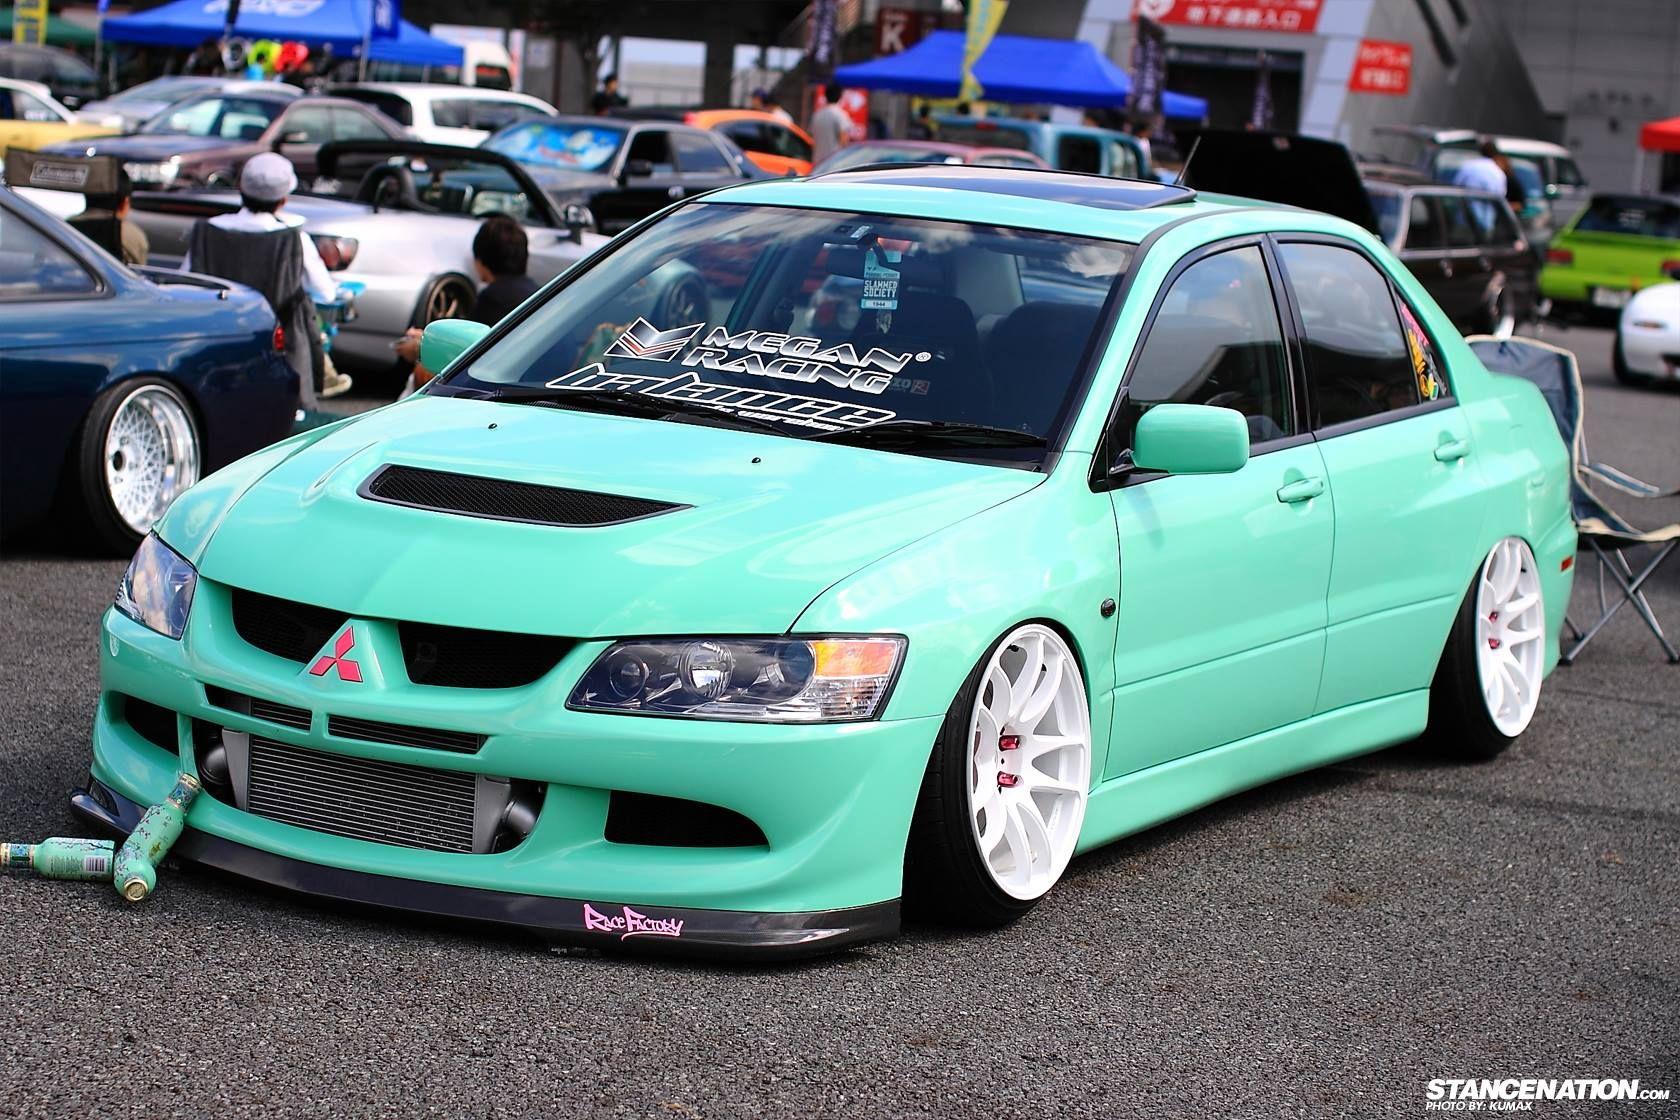 Mint Evo Cars Car Vehicles Cars